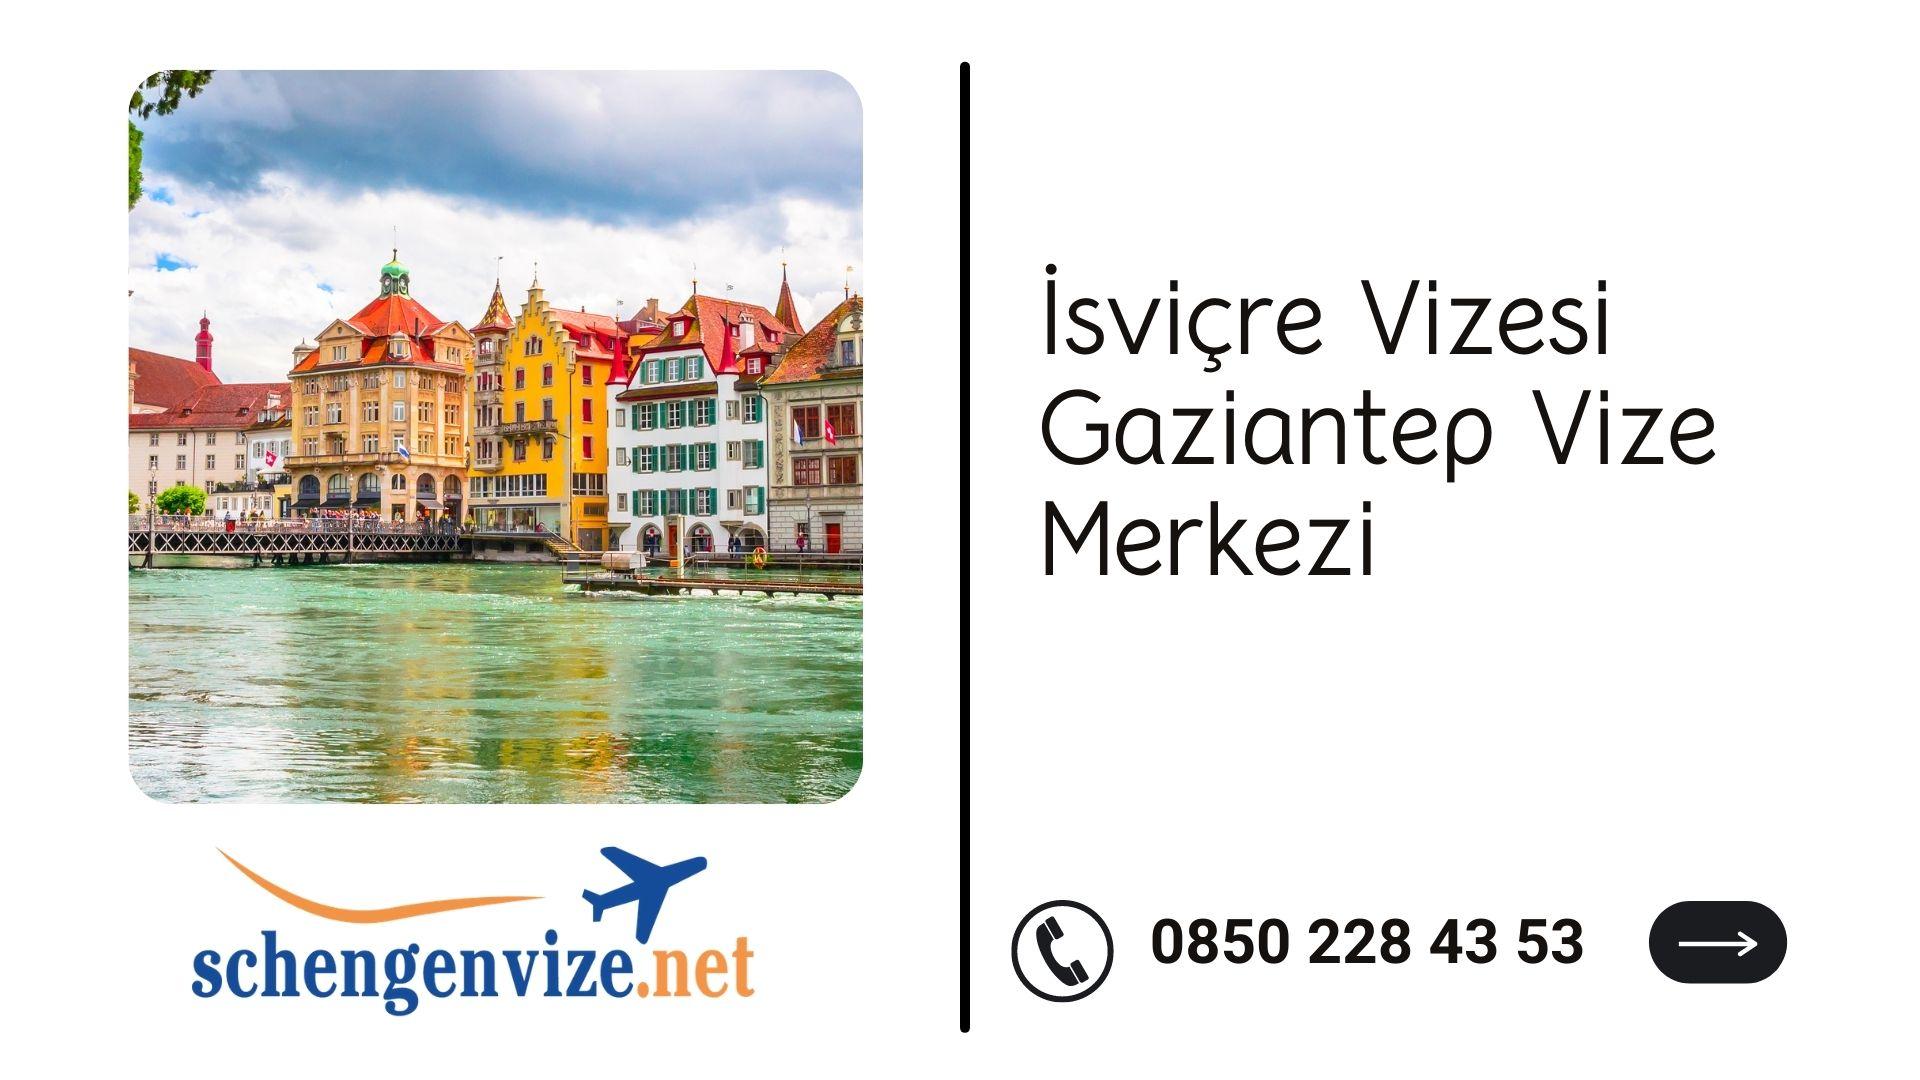 İsviçre Vizesi Gaziantep Vize Merkezi